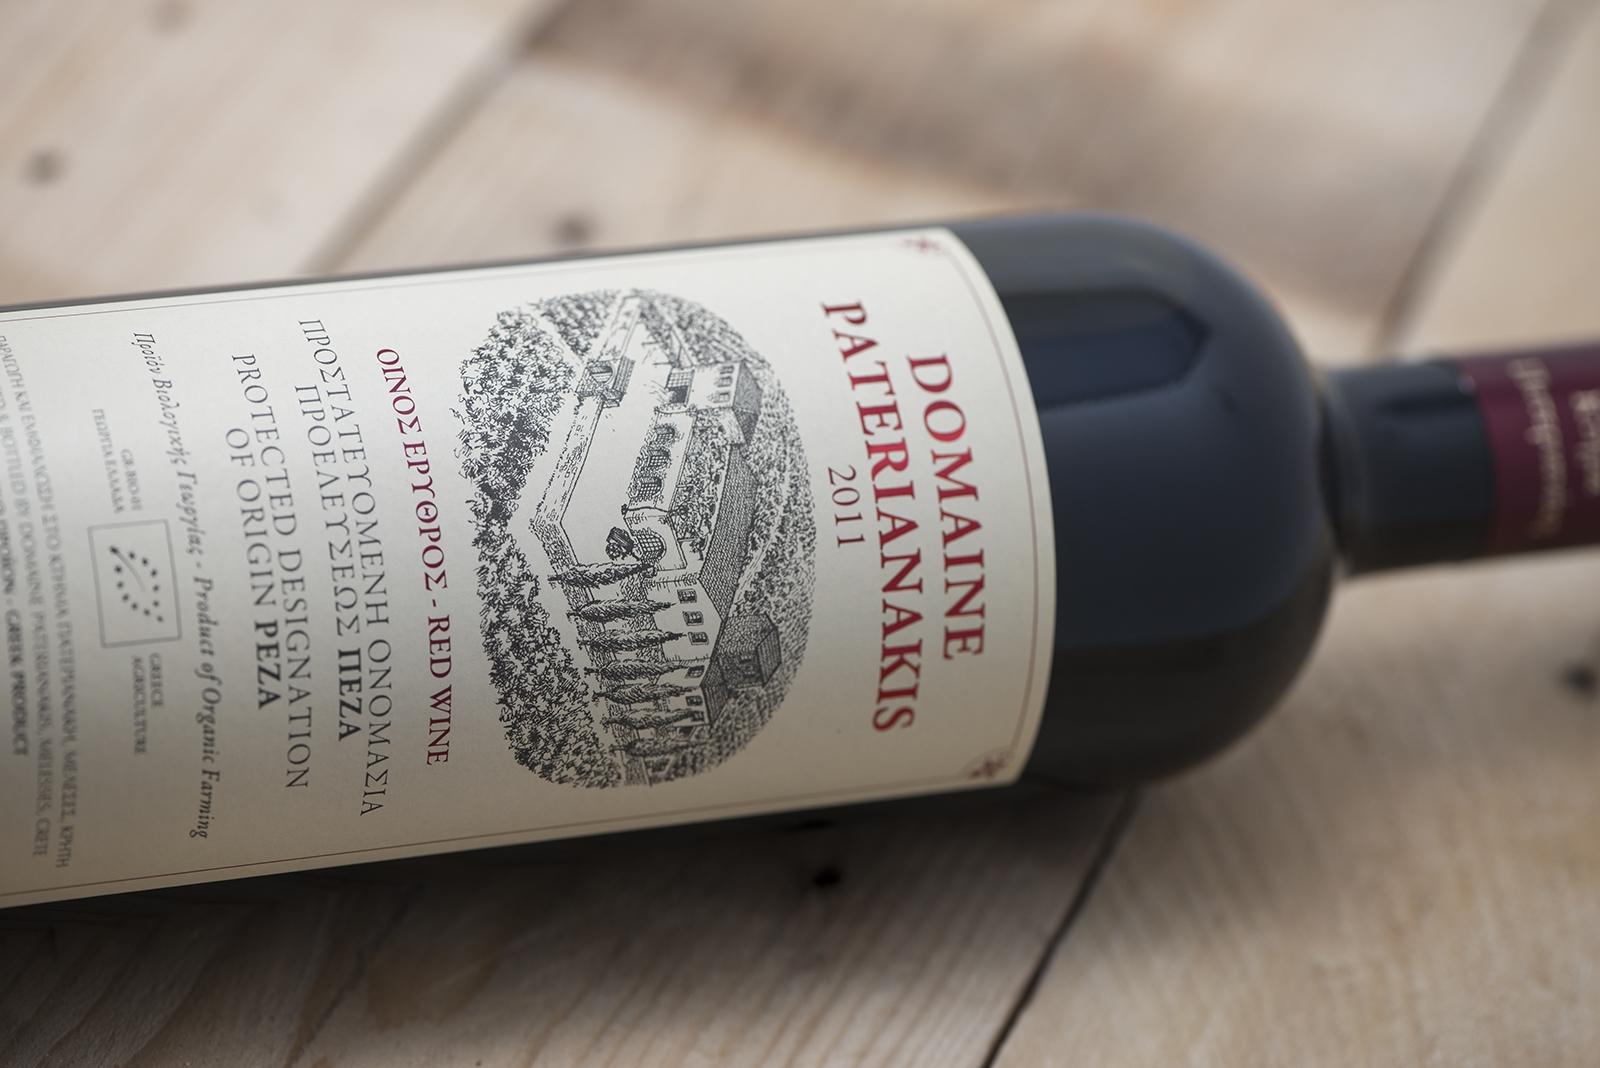 Wein Paterianakis